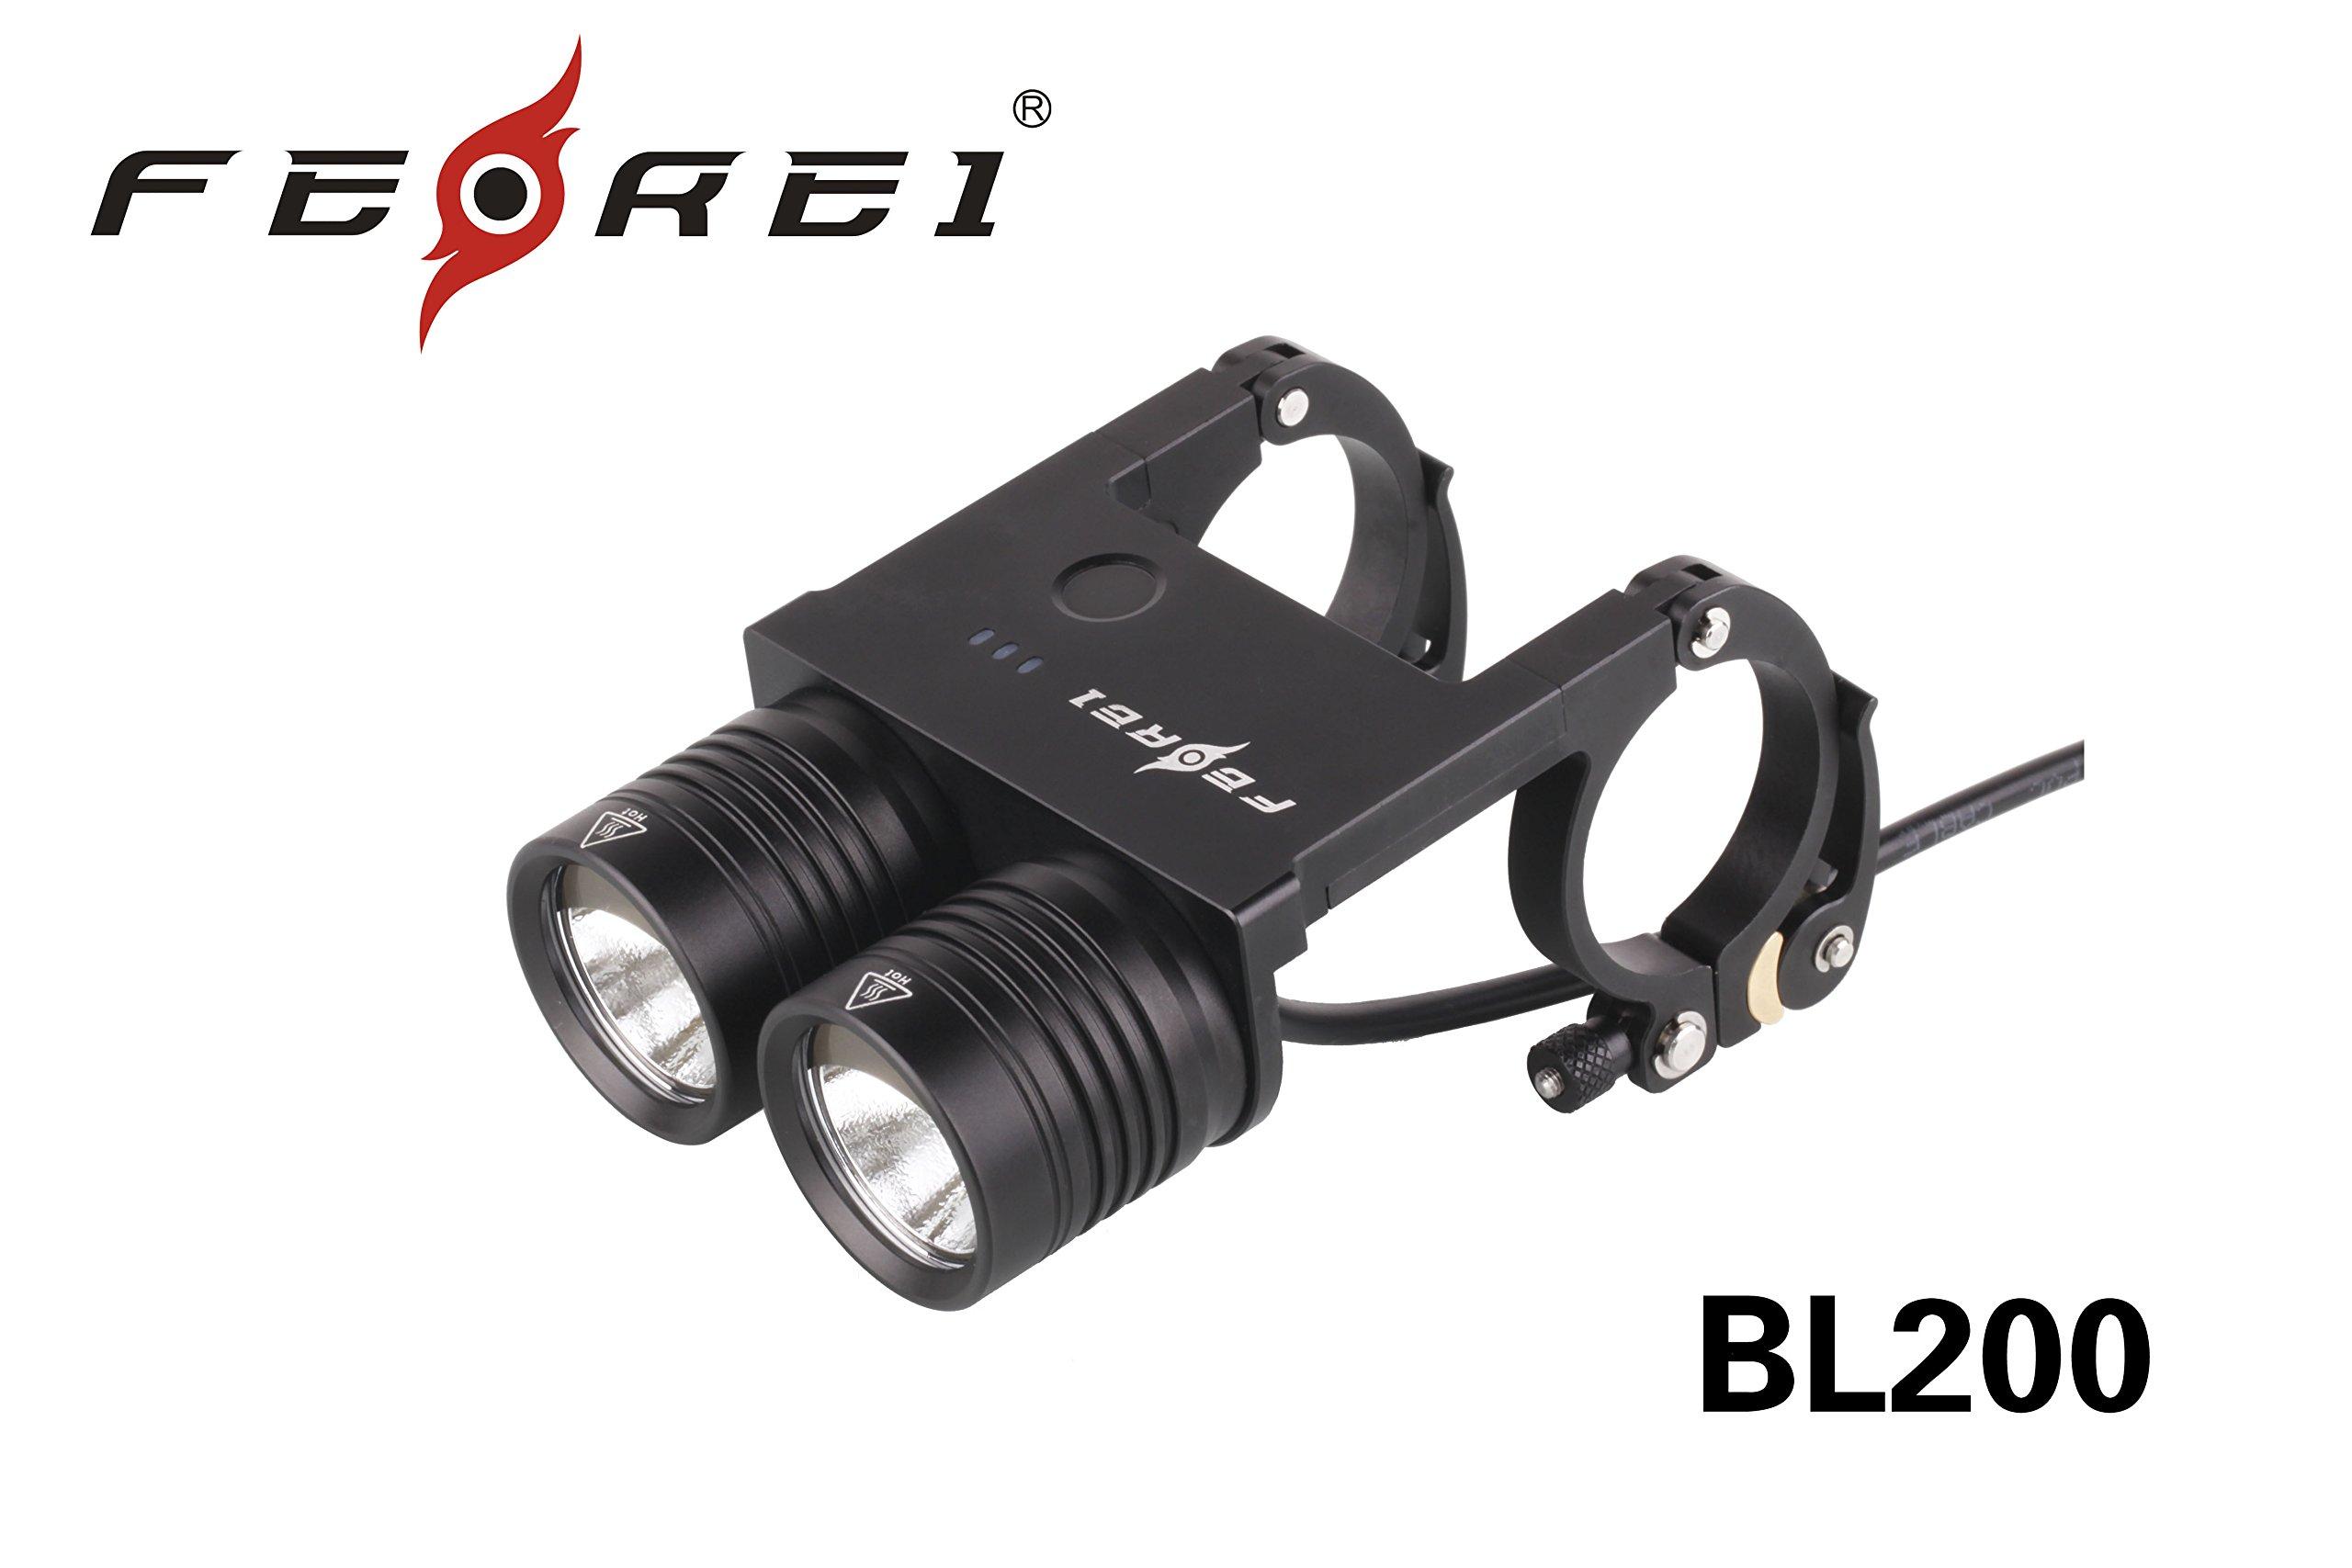 Moveski BL200 bike lights led rechargeable Military aluminum Twin LED Front Bicycle lamp waterproof CREE XM-L LED 860 Lumens-Black